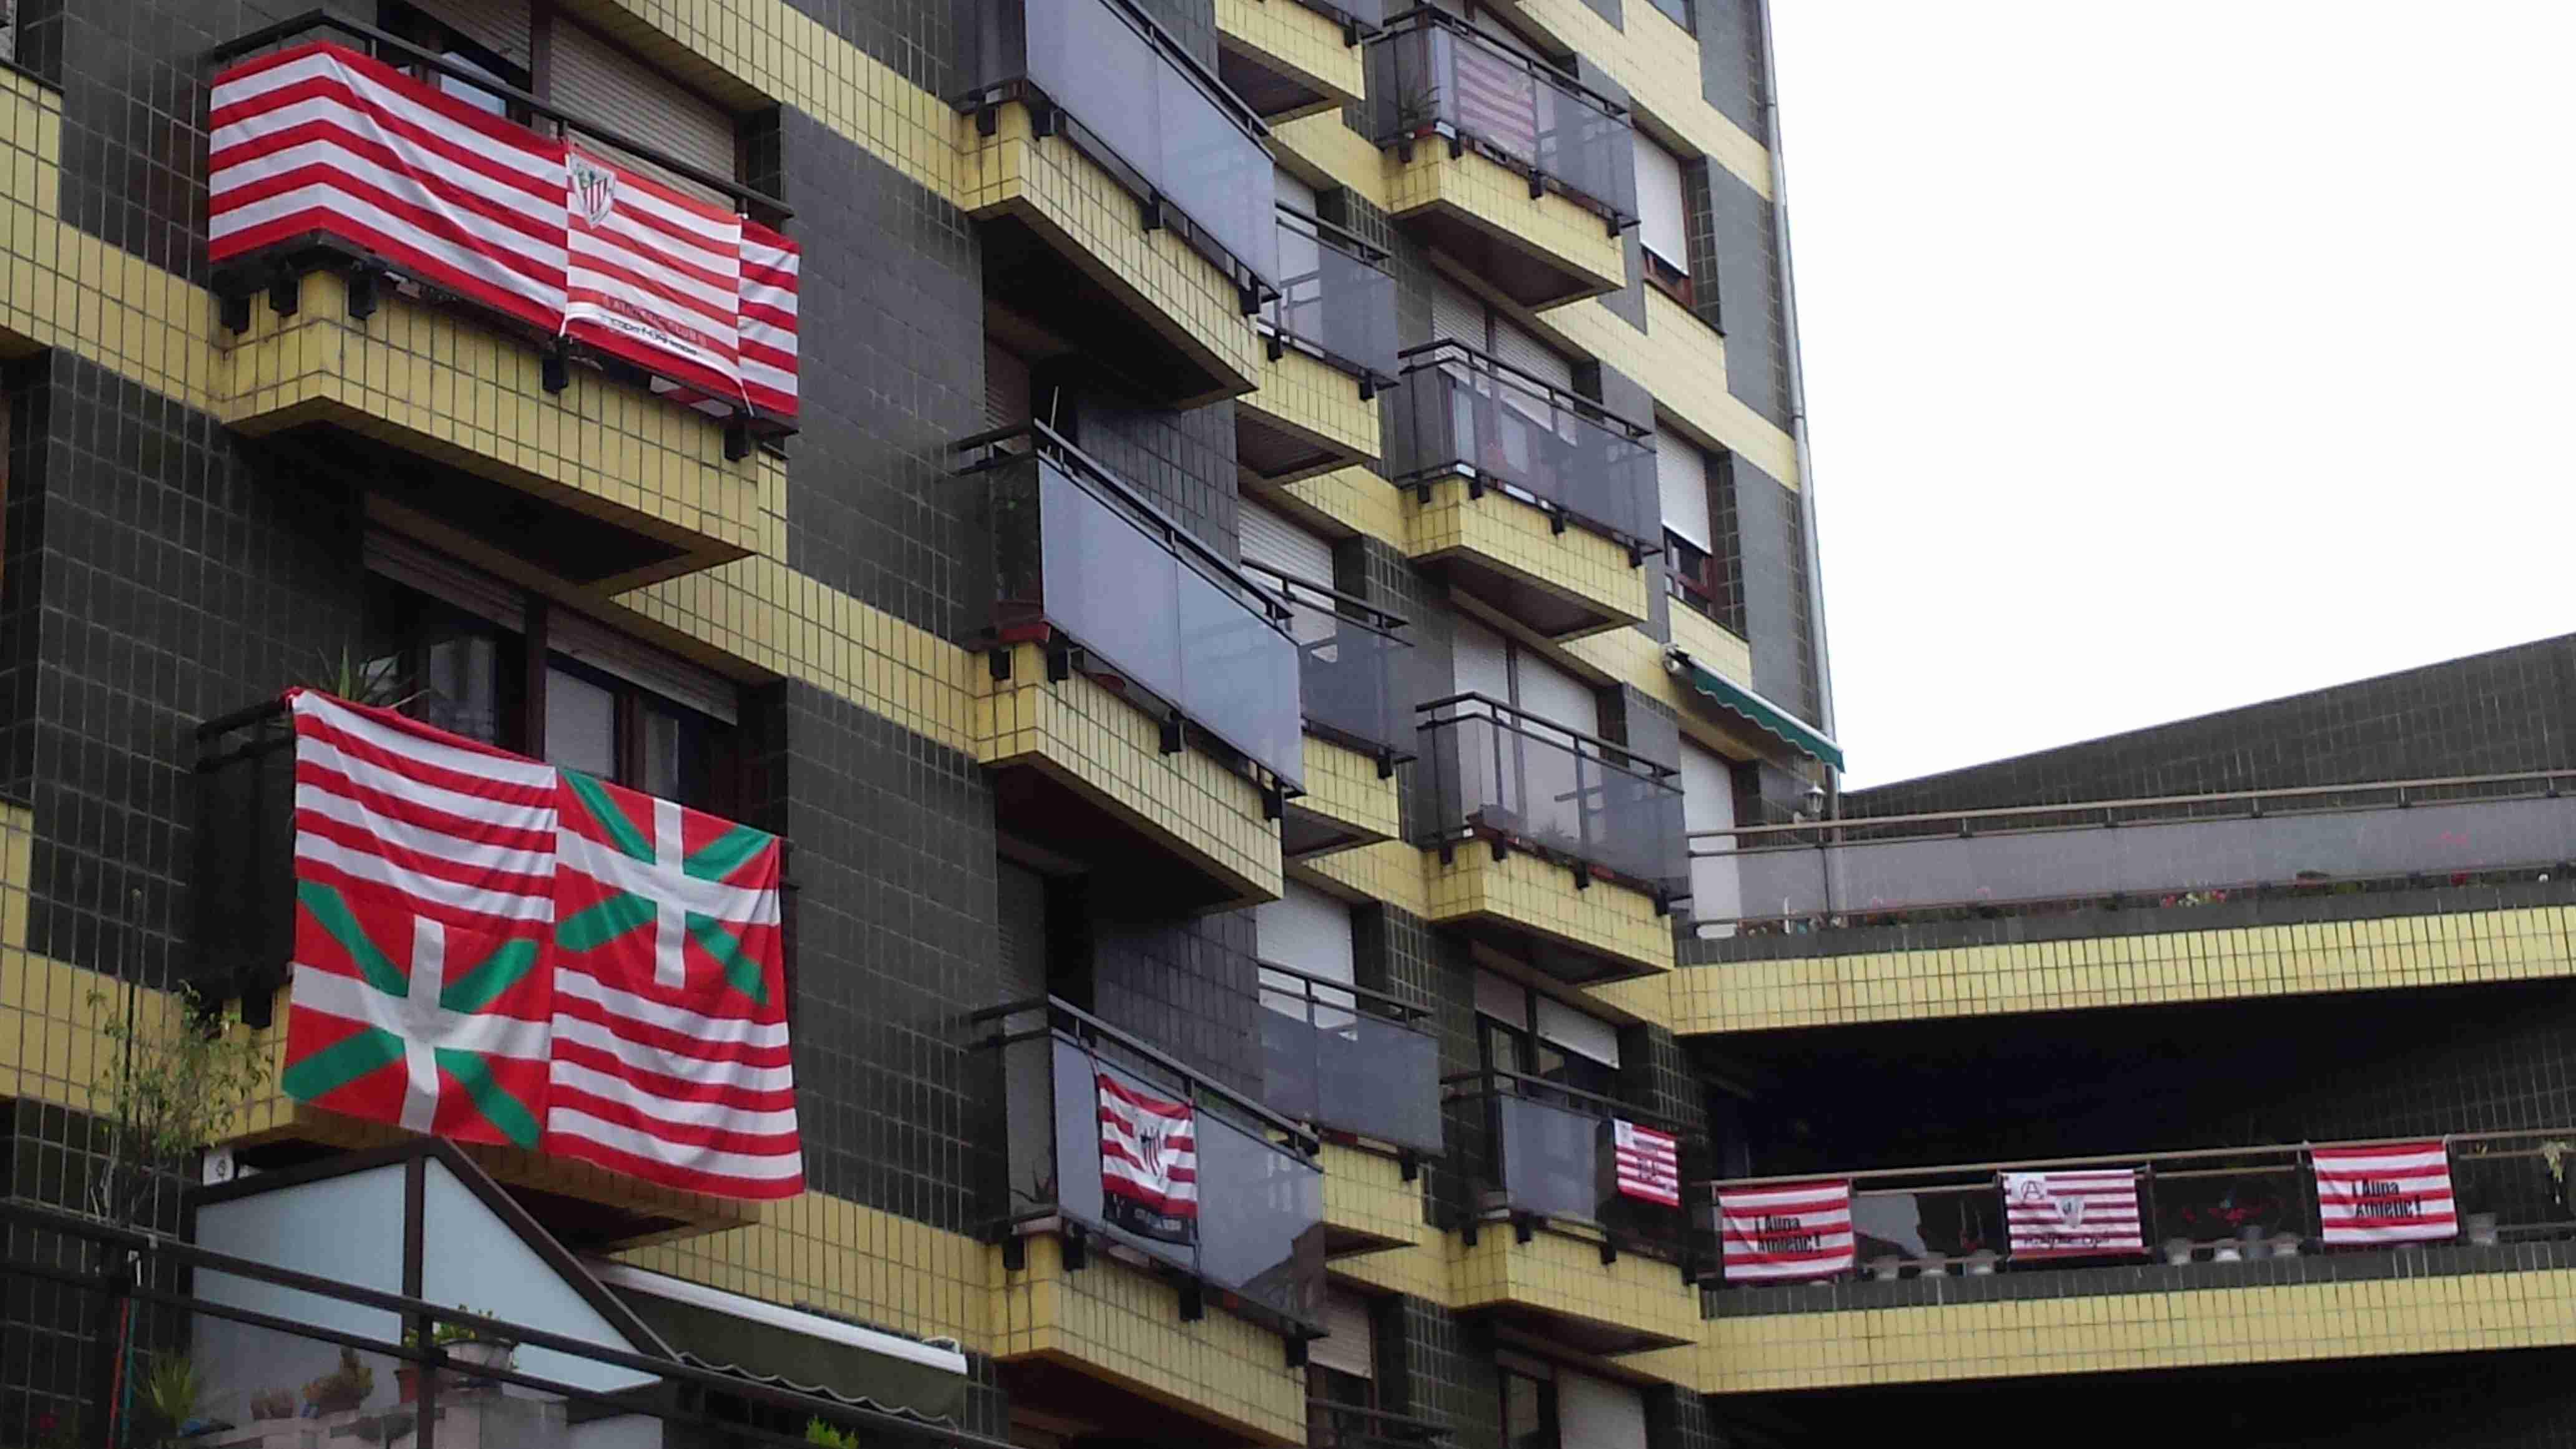 basauri-banderas-nafarroa-kalea